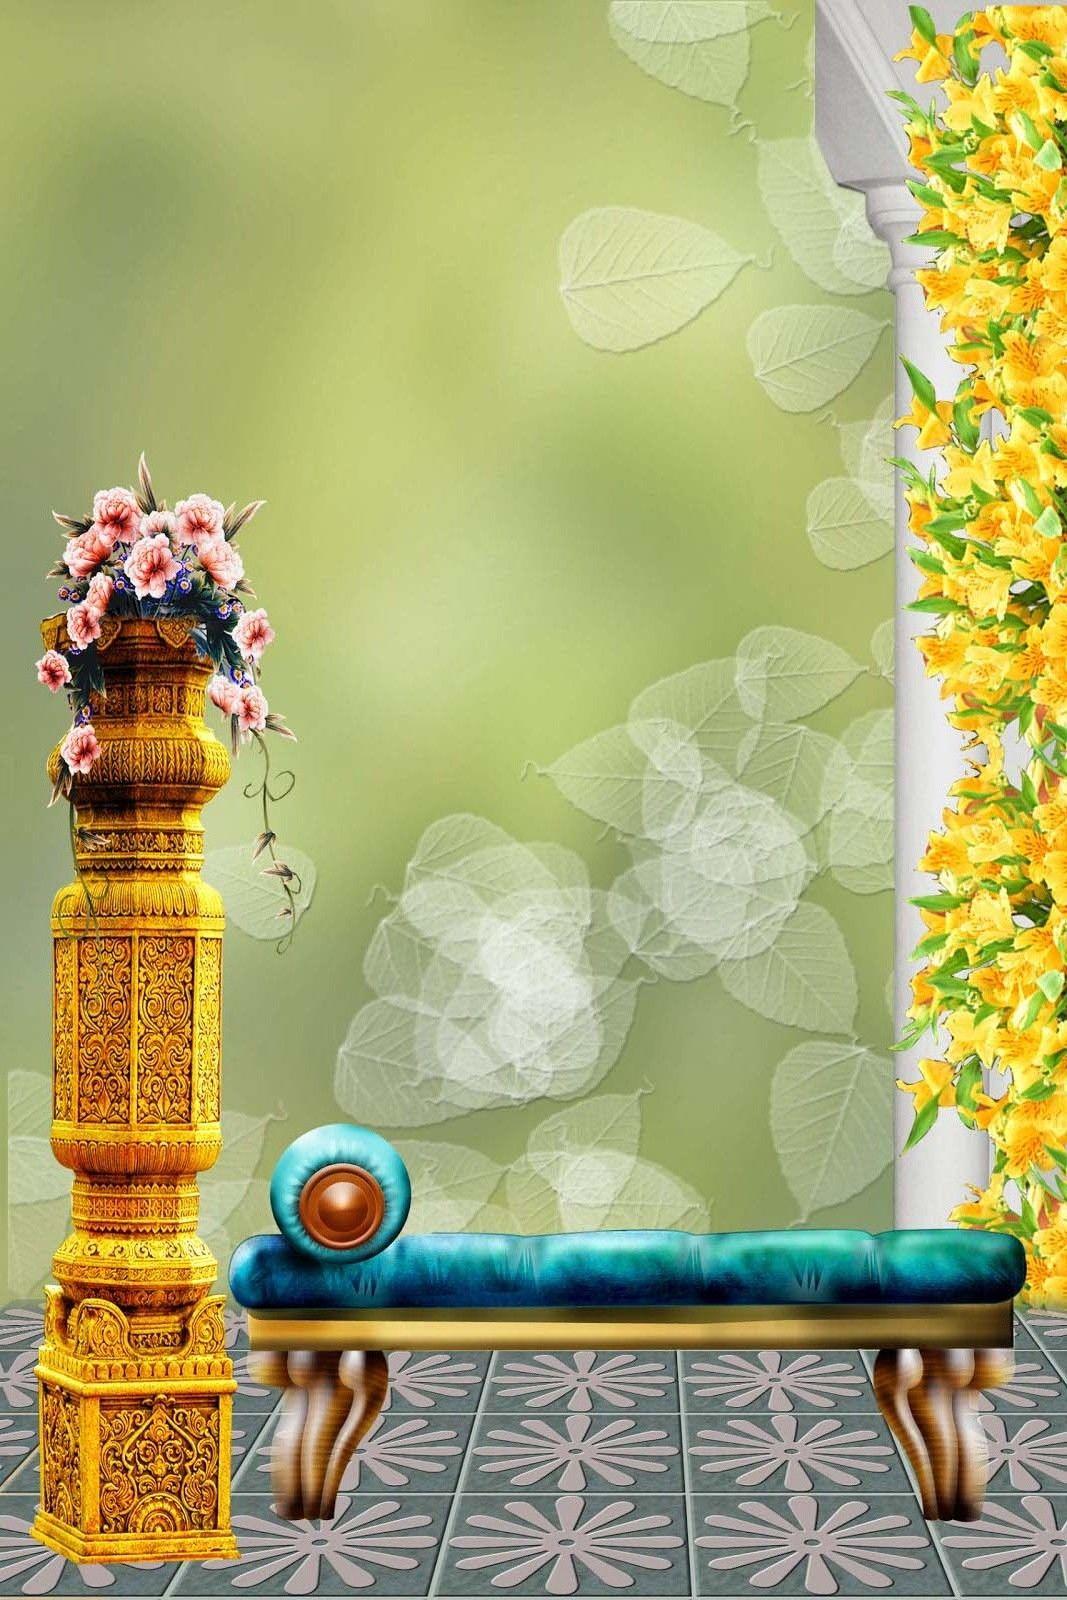 Download Kumpulan Koleksi Background Alam Pinterest Gratis Terbaru